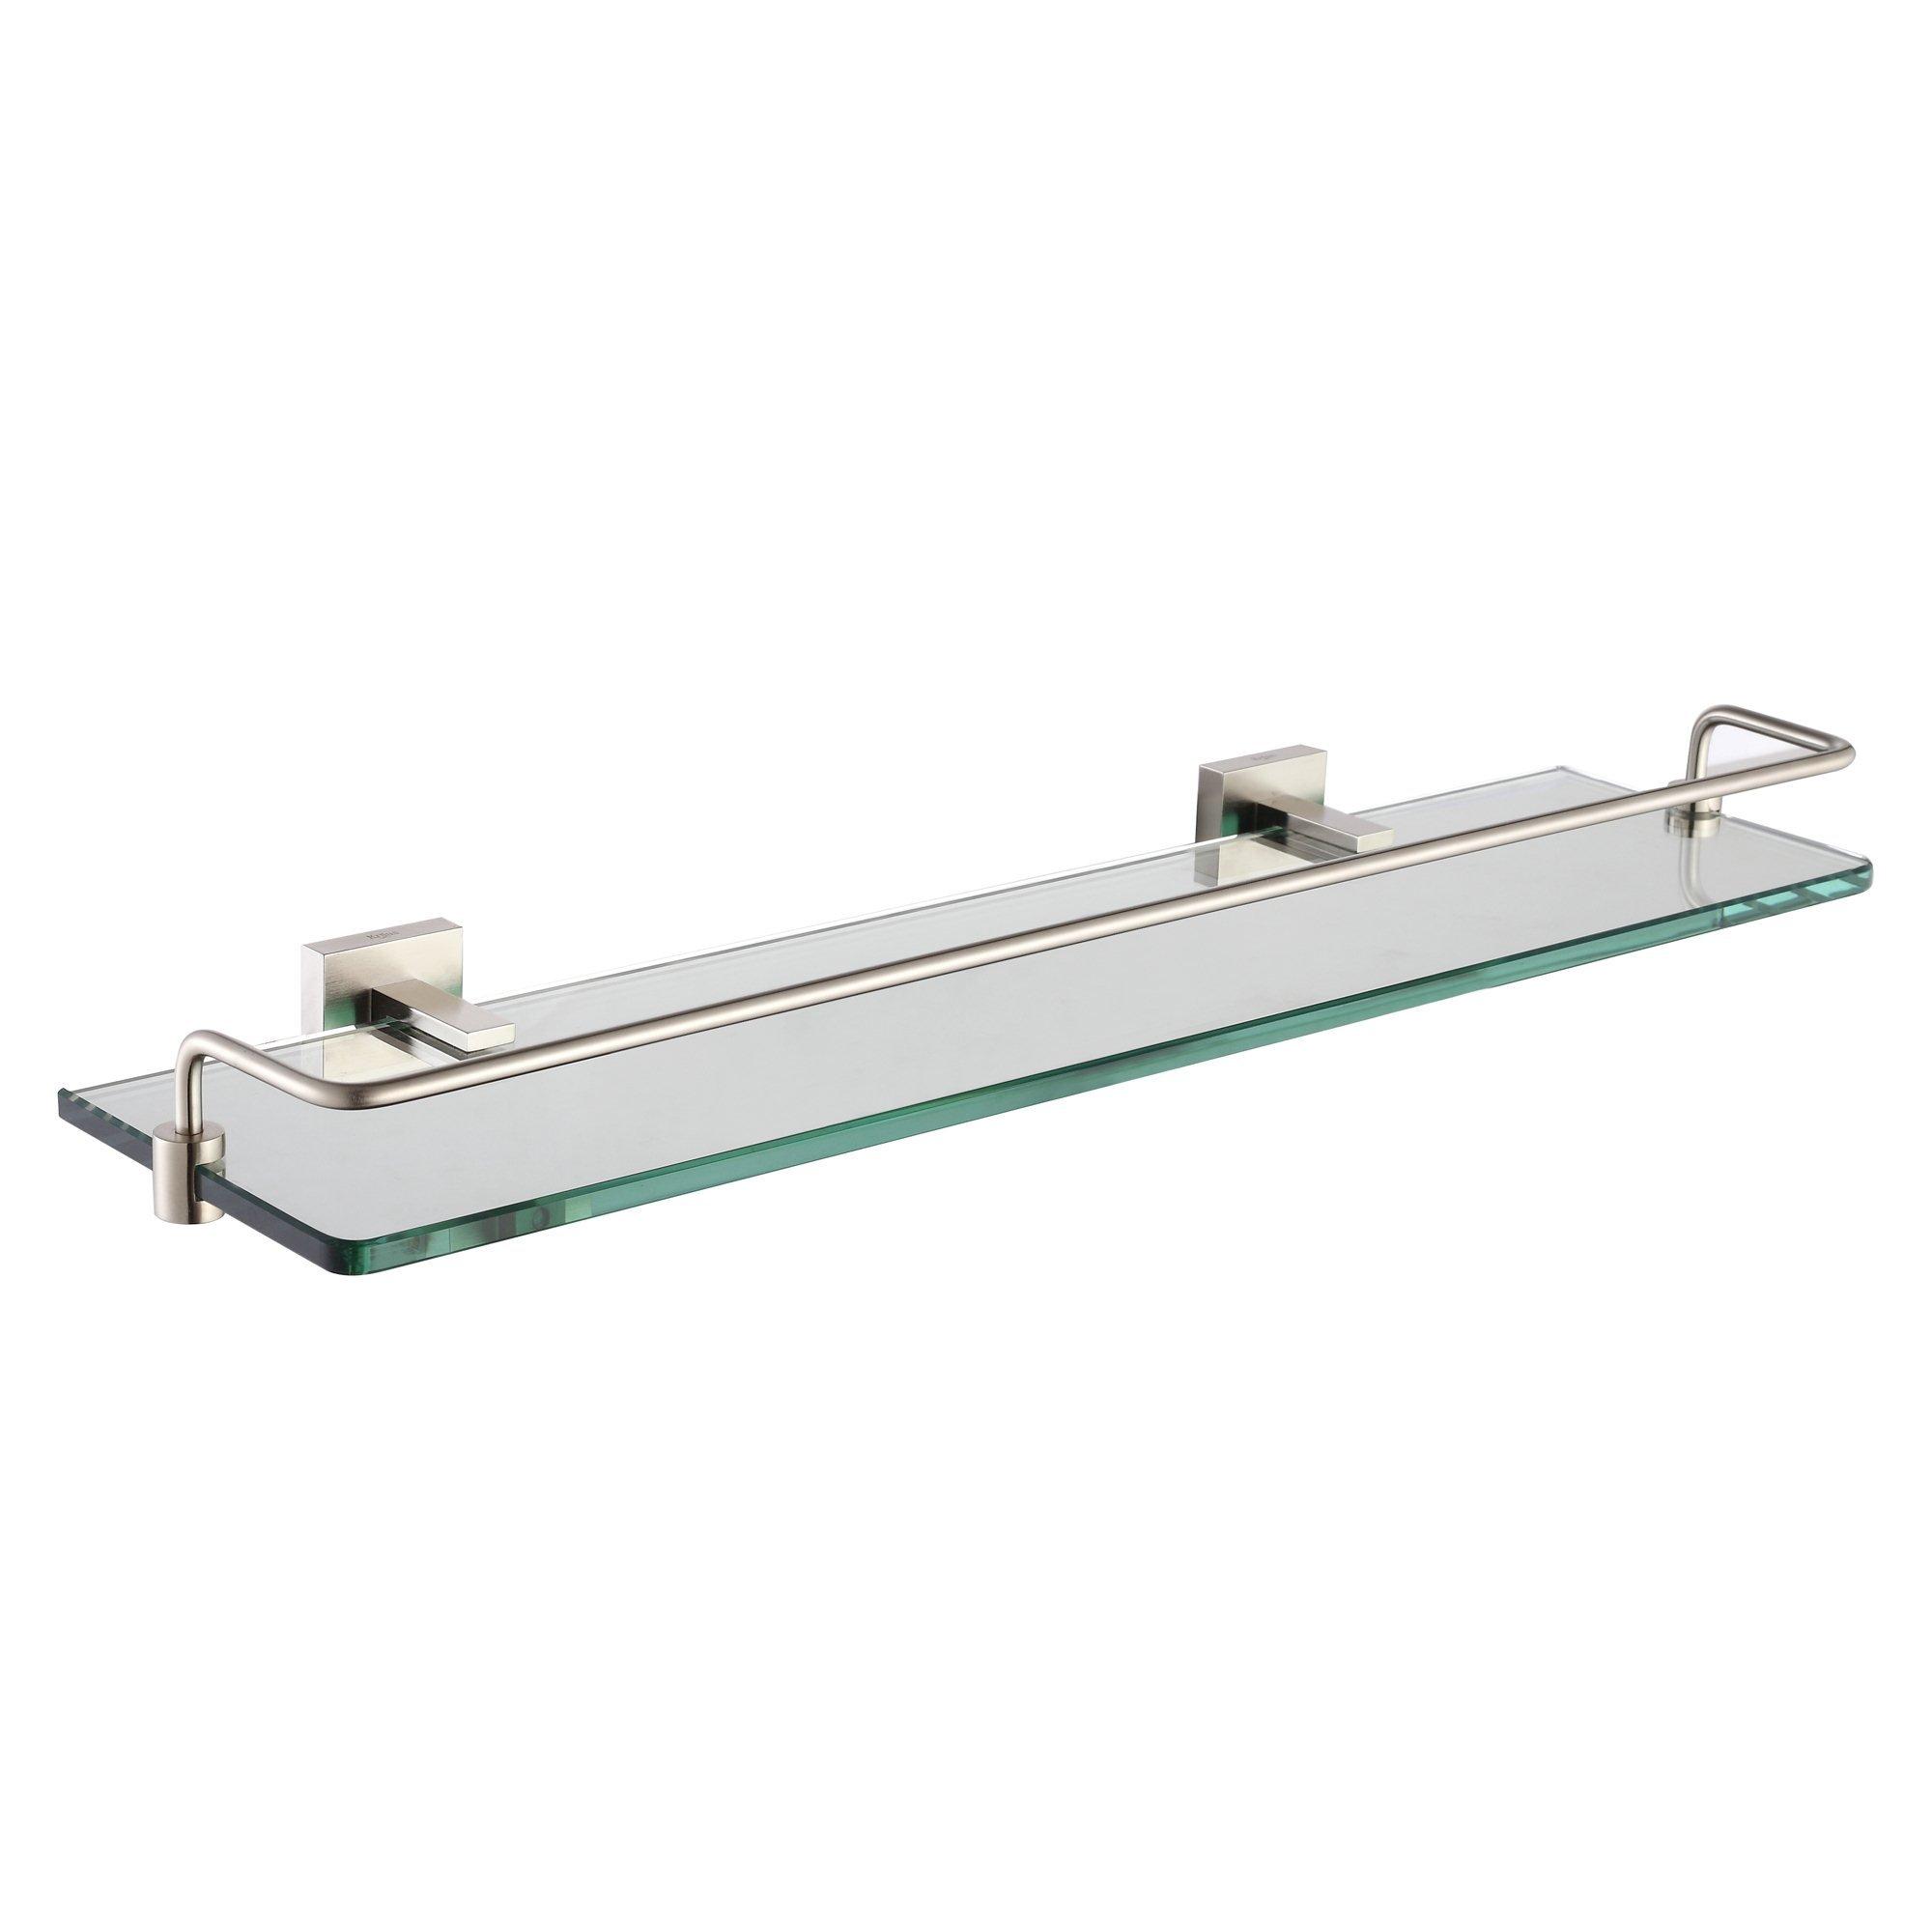 Kraus KEA-14445BN Aura Bathroom Accessories - Shelf with Railing Brushed Nickel by Kraus (Image #1)